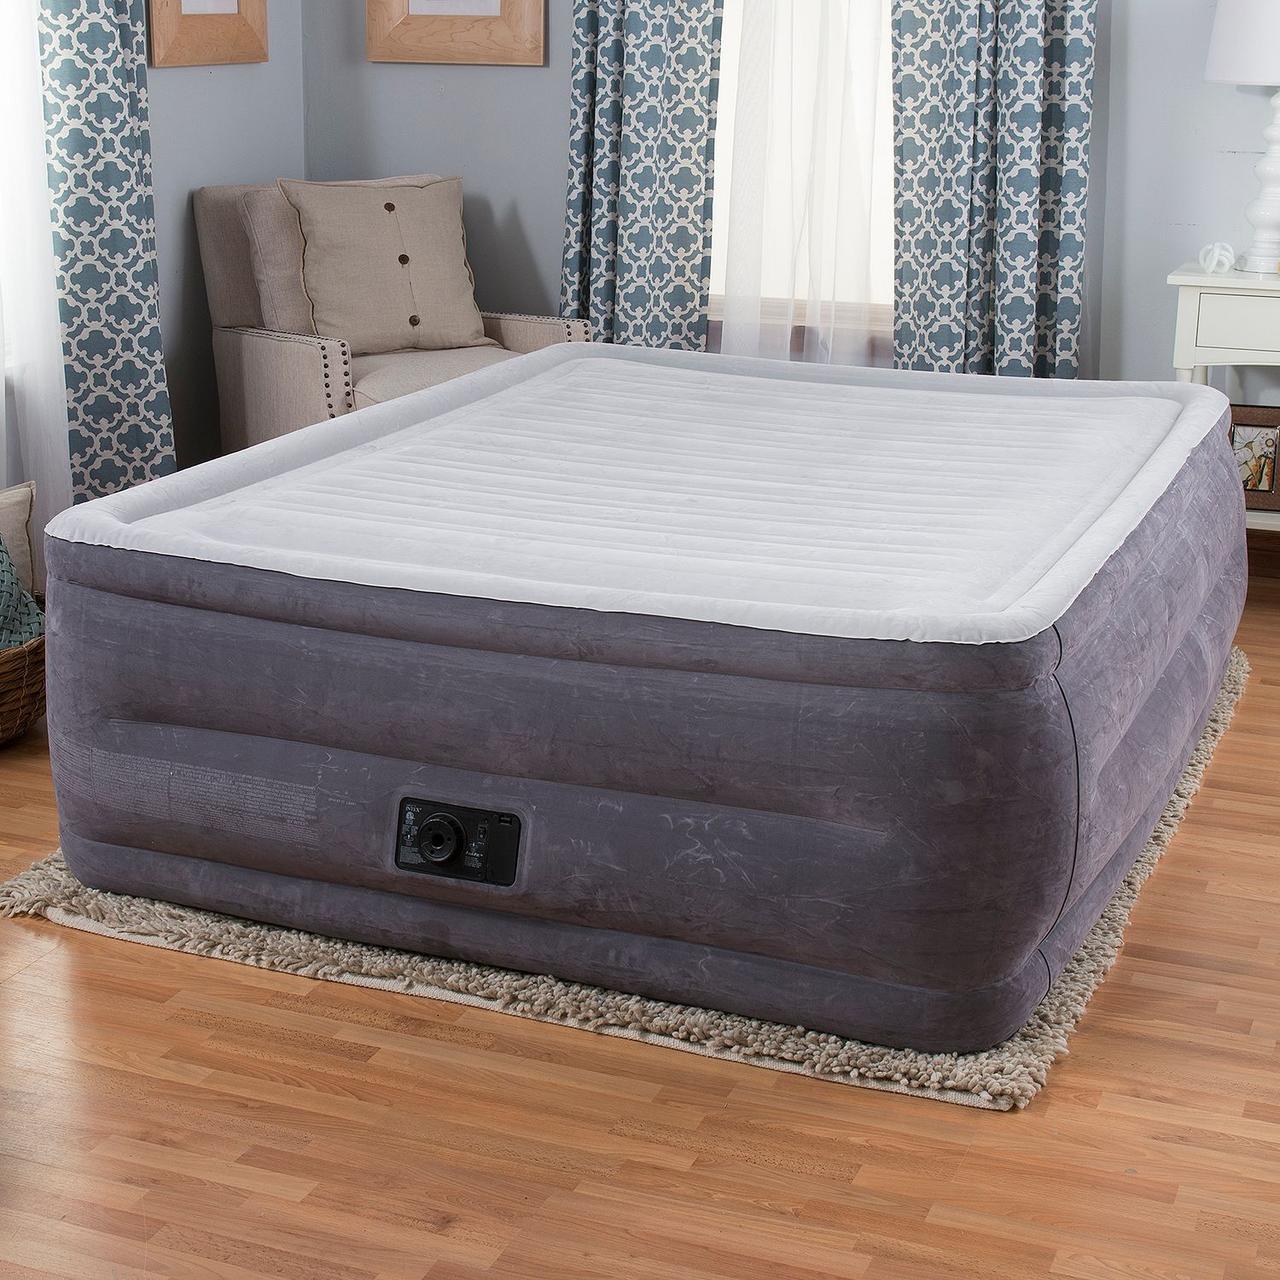 Надувная кровать Intex 64418 (203х152х56) - электронасос.